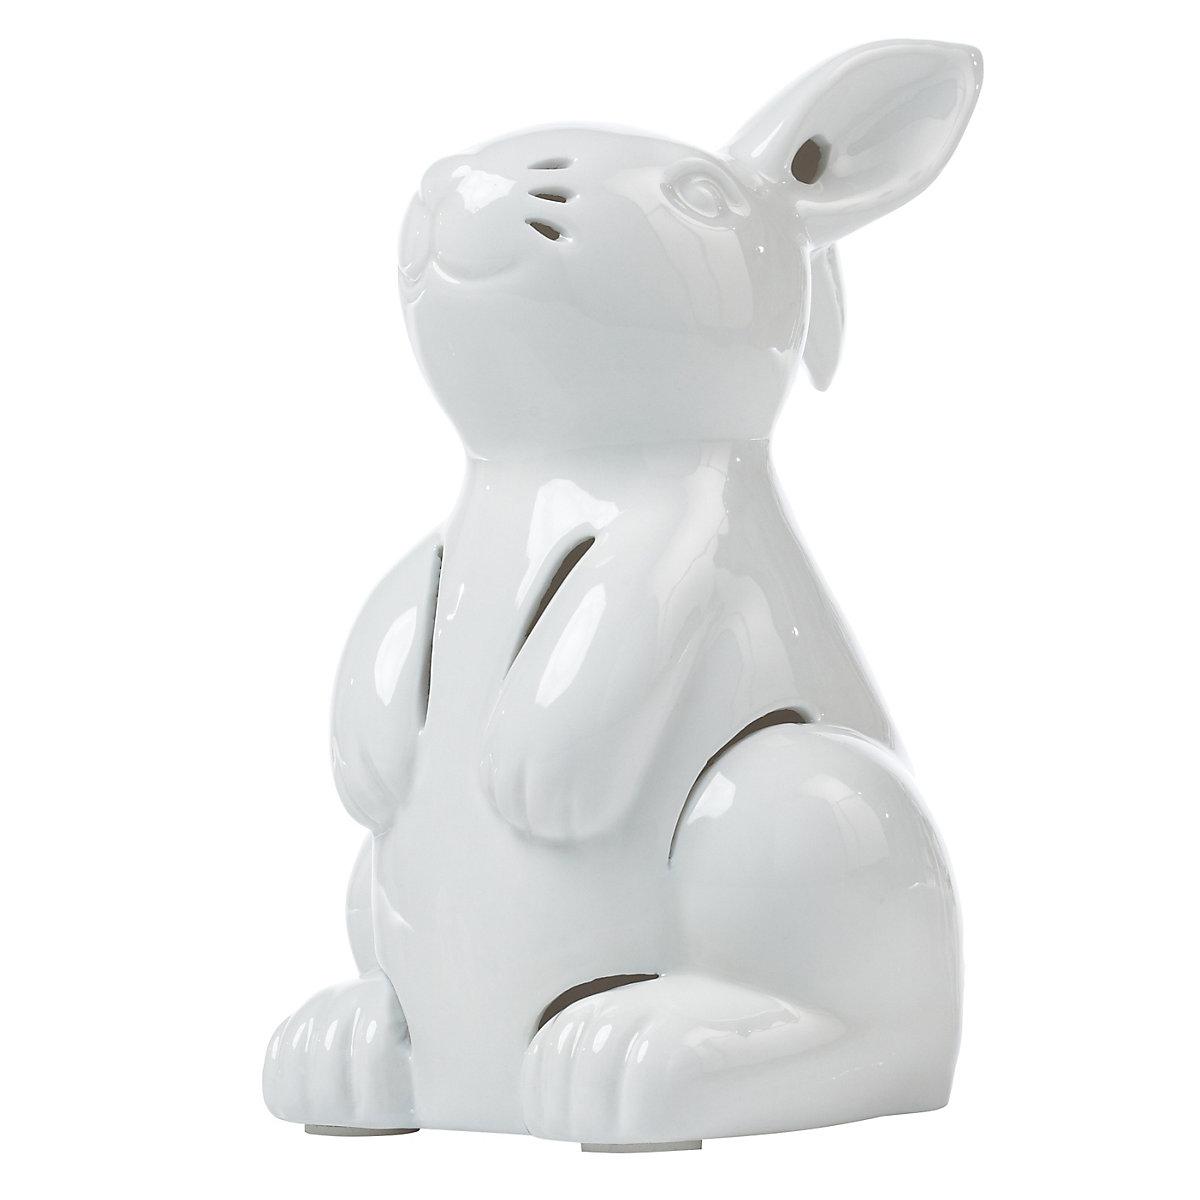 Mothercare Ceramic Lamp- Rabbit